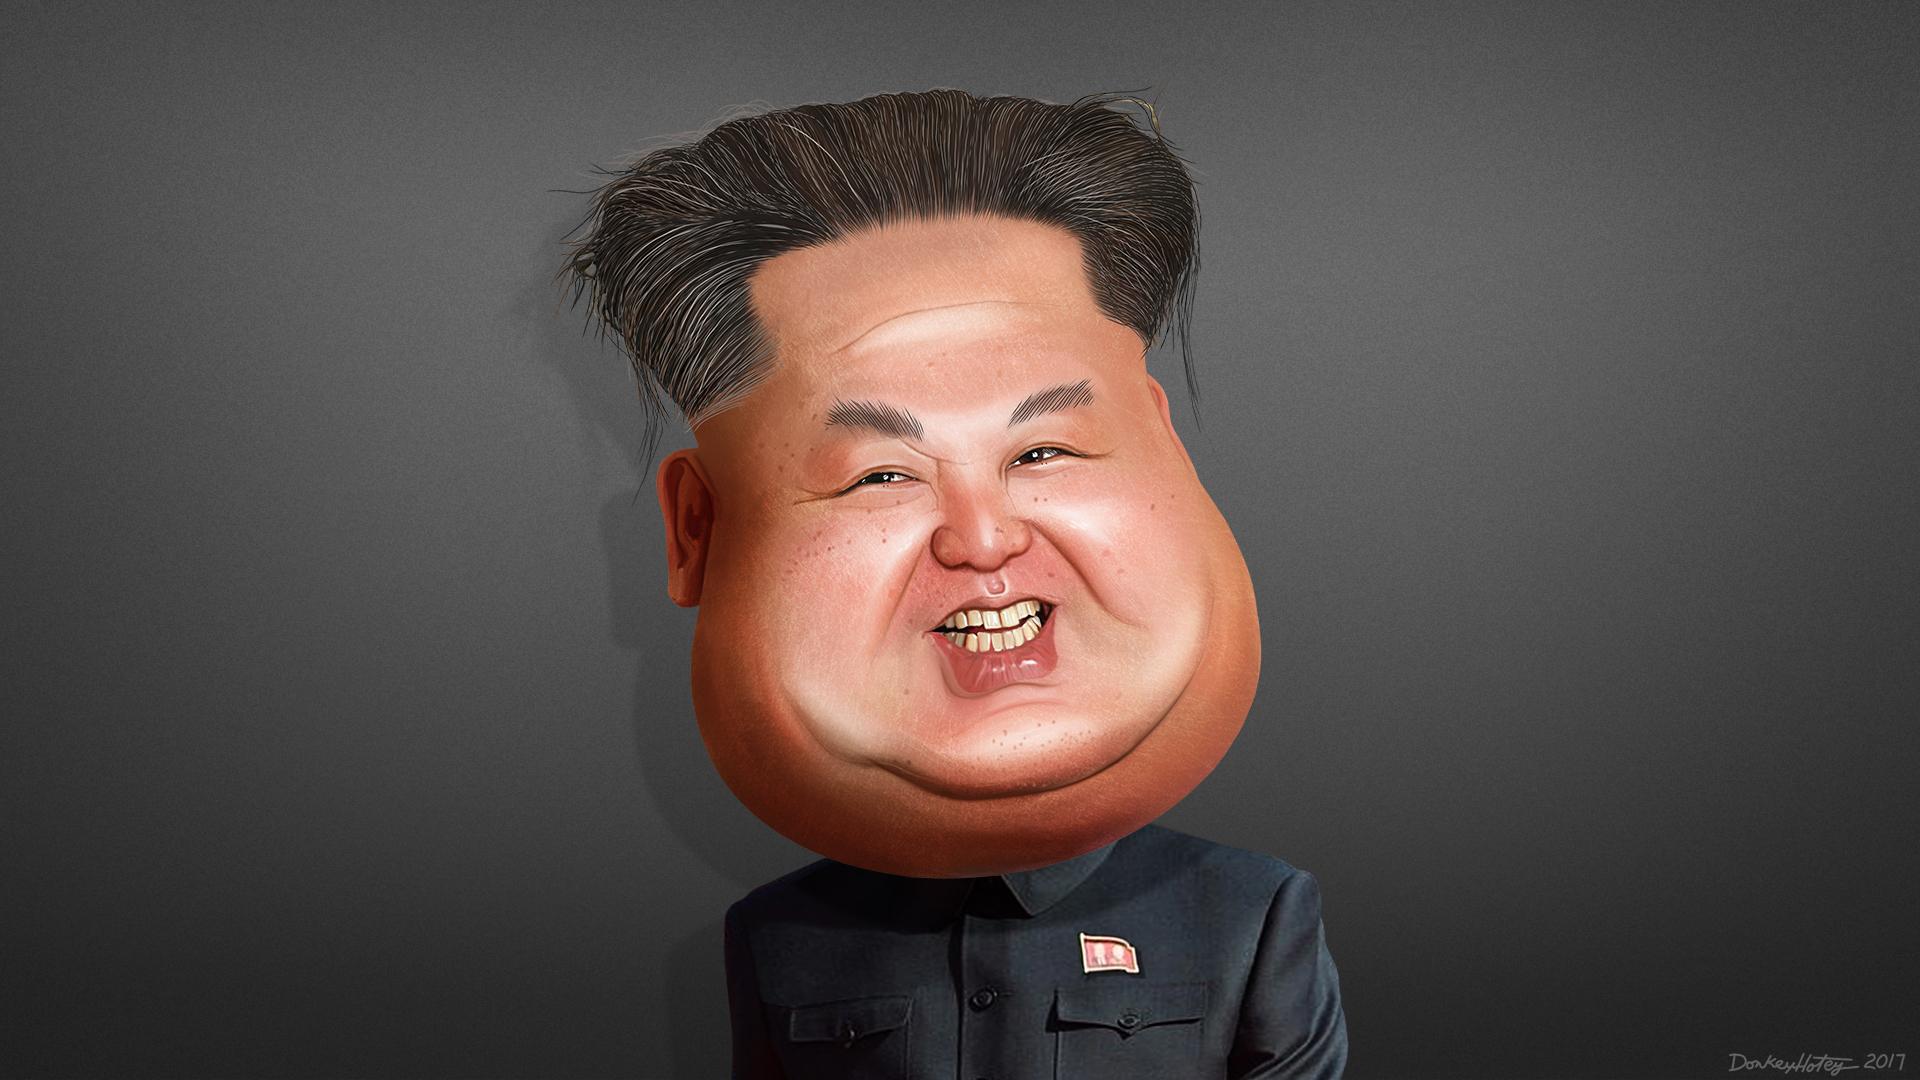 Kim_Jong-un_-_Caricature_(36564447074).jpg